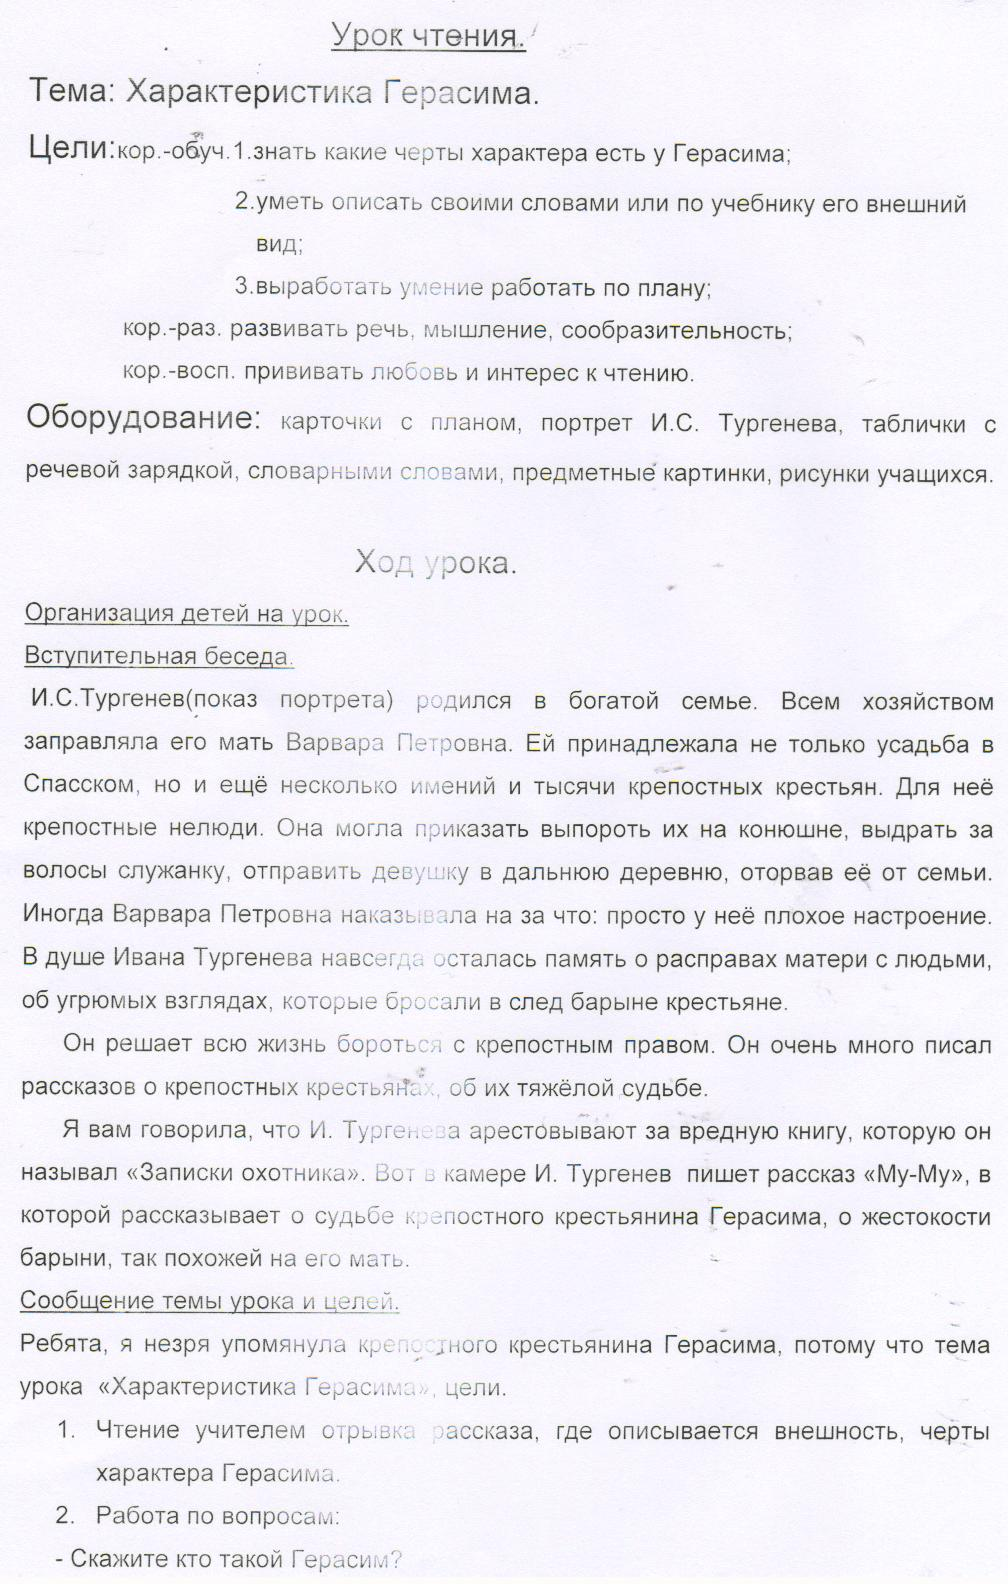 C:\Documents and Settings\Администратор\Рабочий стол\Тептякова Е.А. 016.jpg